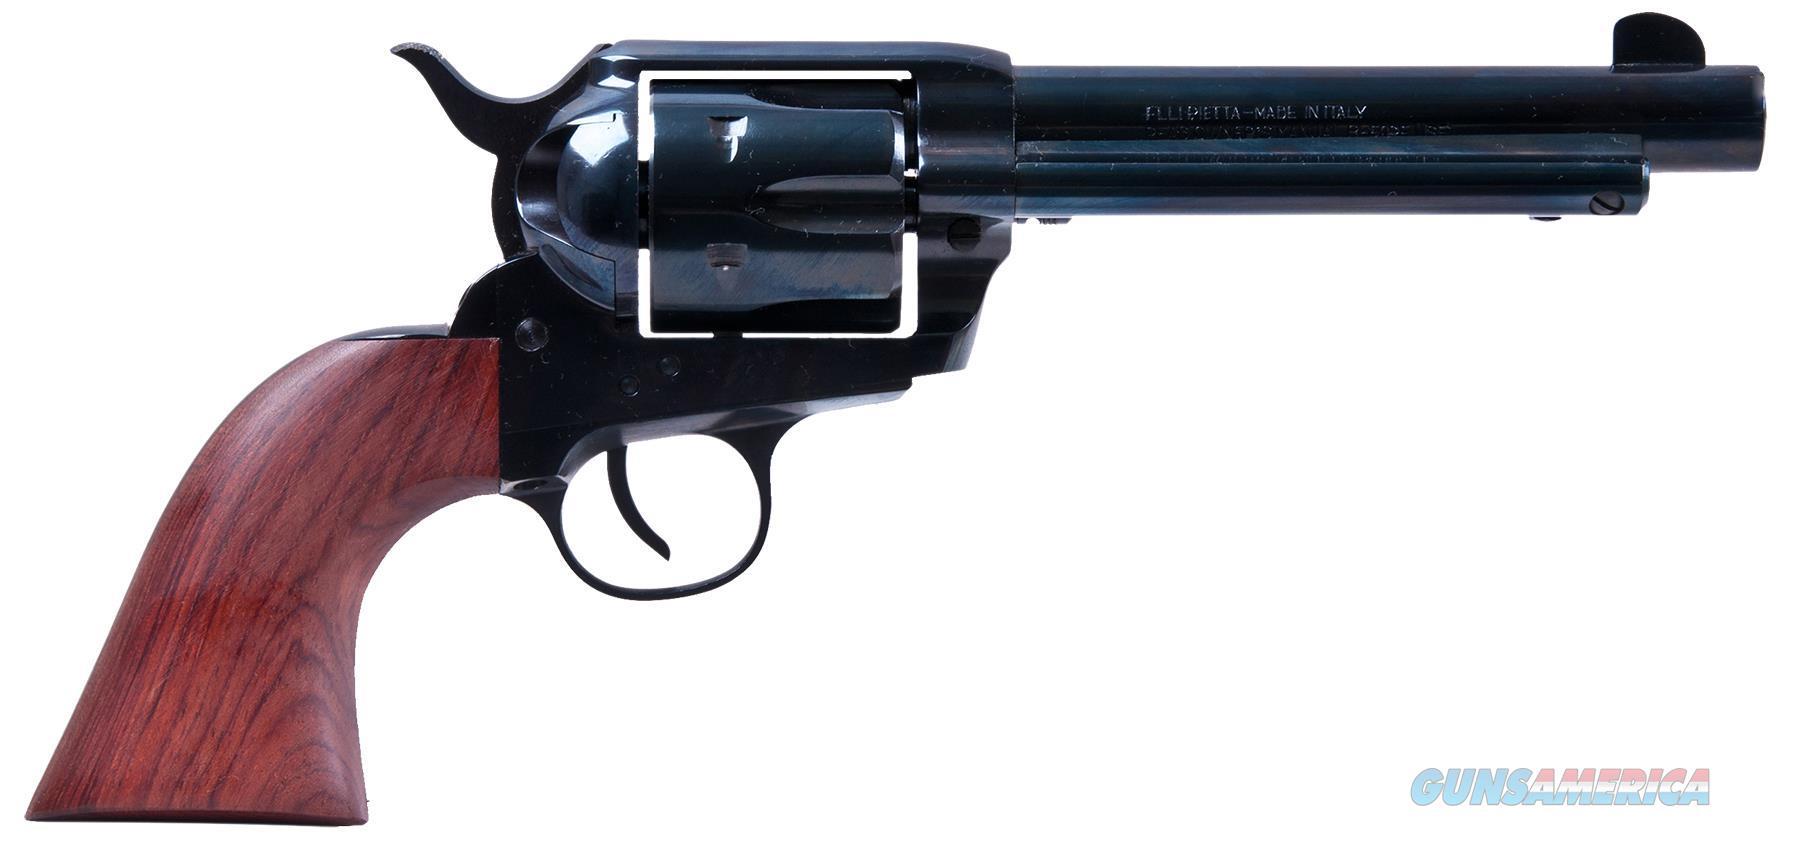 "Heritage Mfg Rr357b4 Rough Rider Big Bore Single 357 Magnum 4.75"" 6 Cocobolo Blued RR357B4  Guns > Pistols > Heritage"